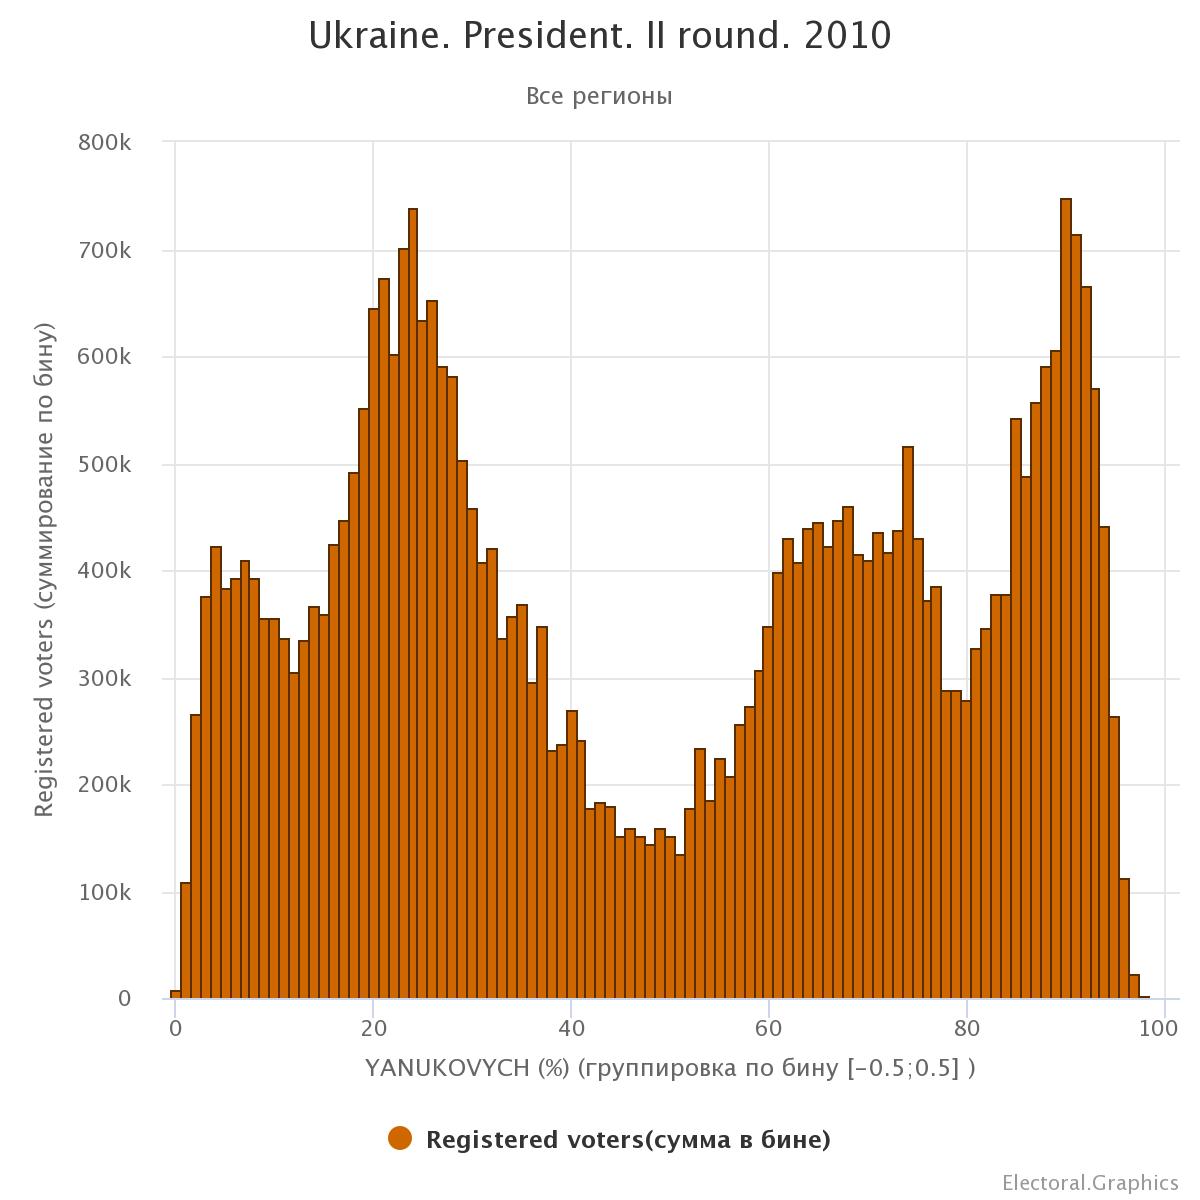 ukraine-president-ii-rou (2).png